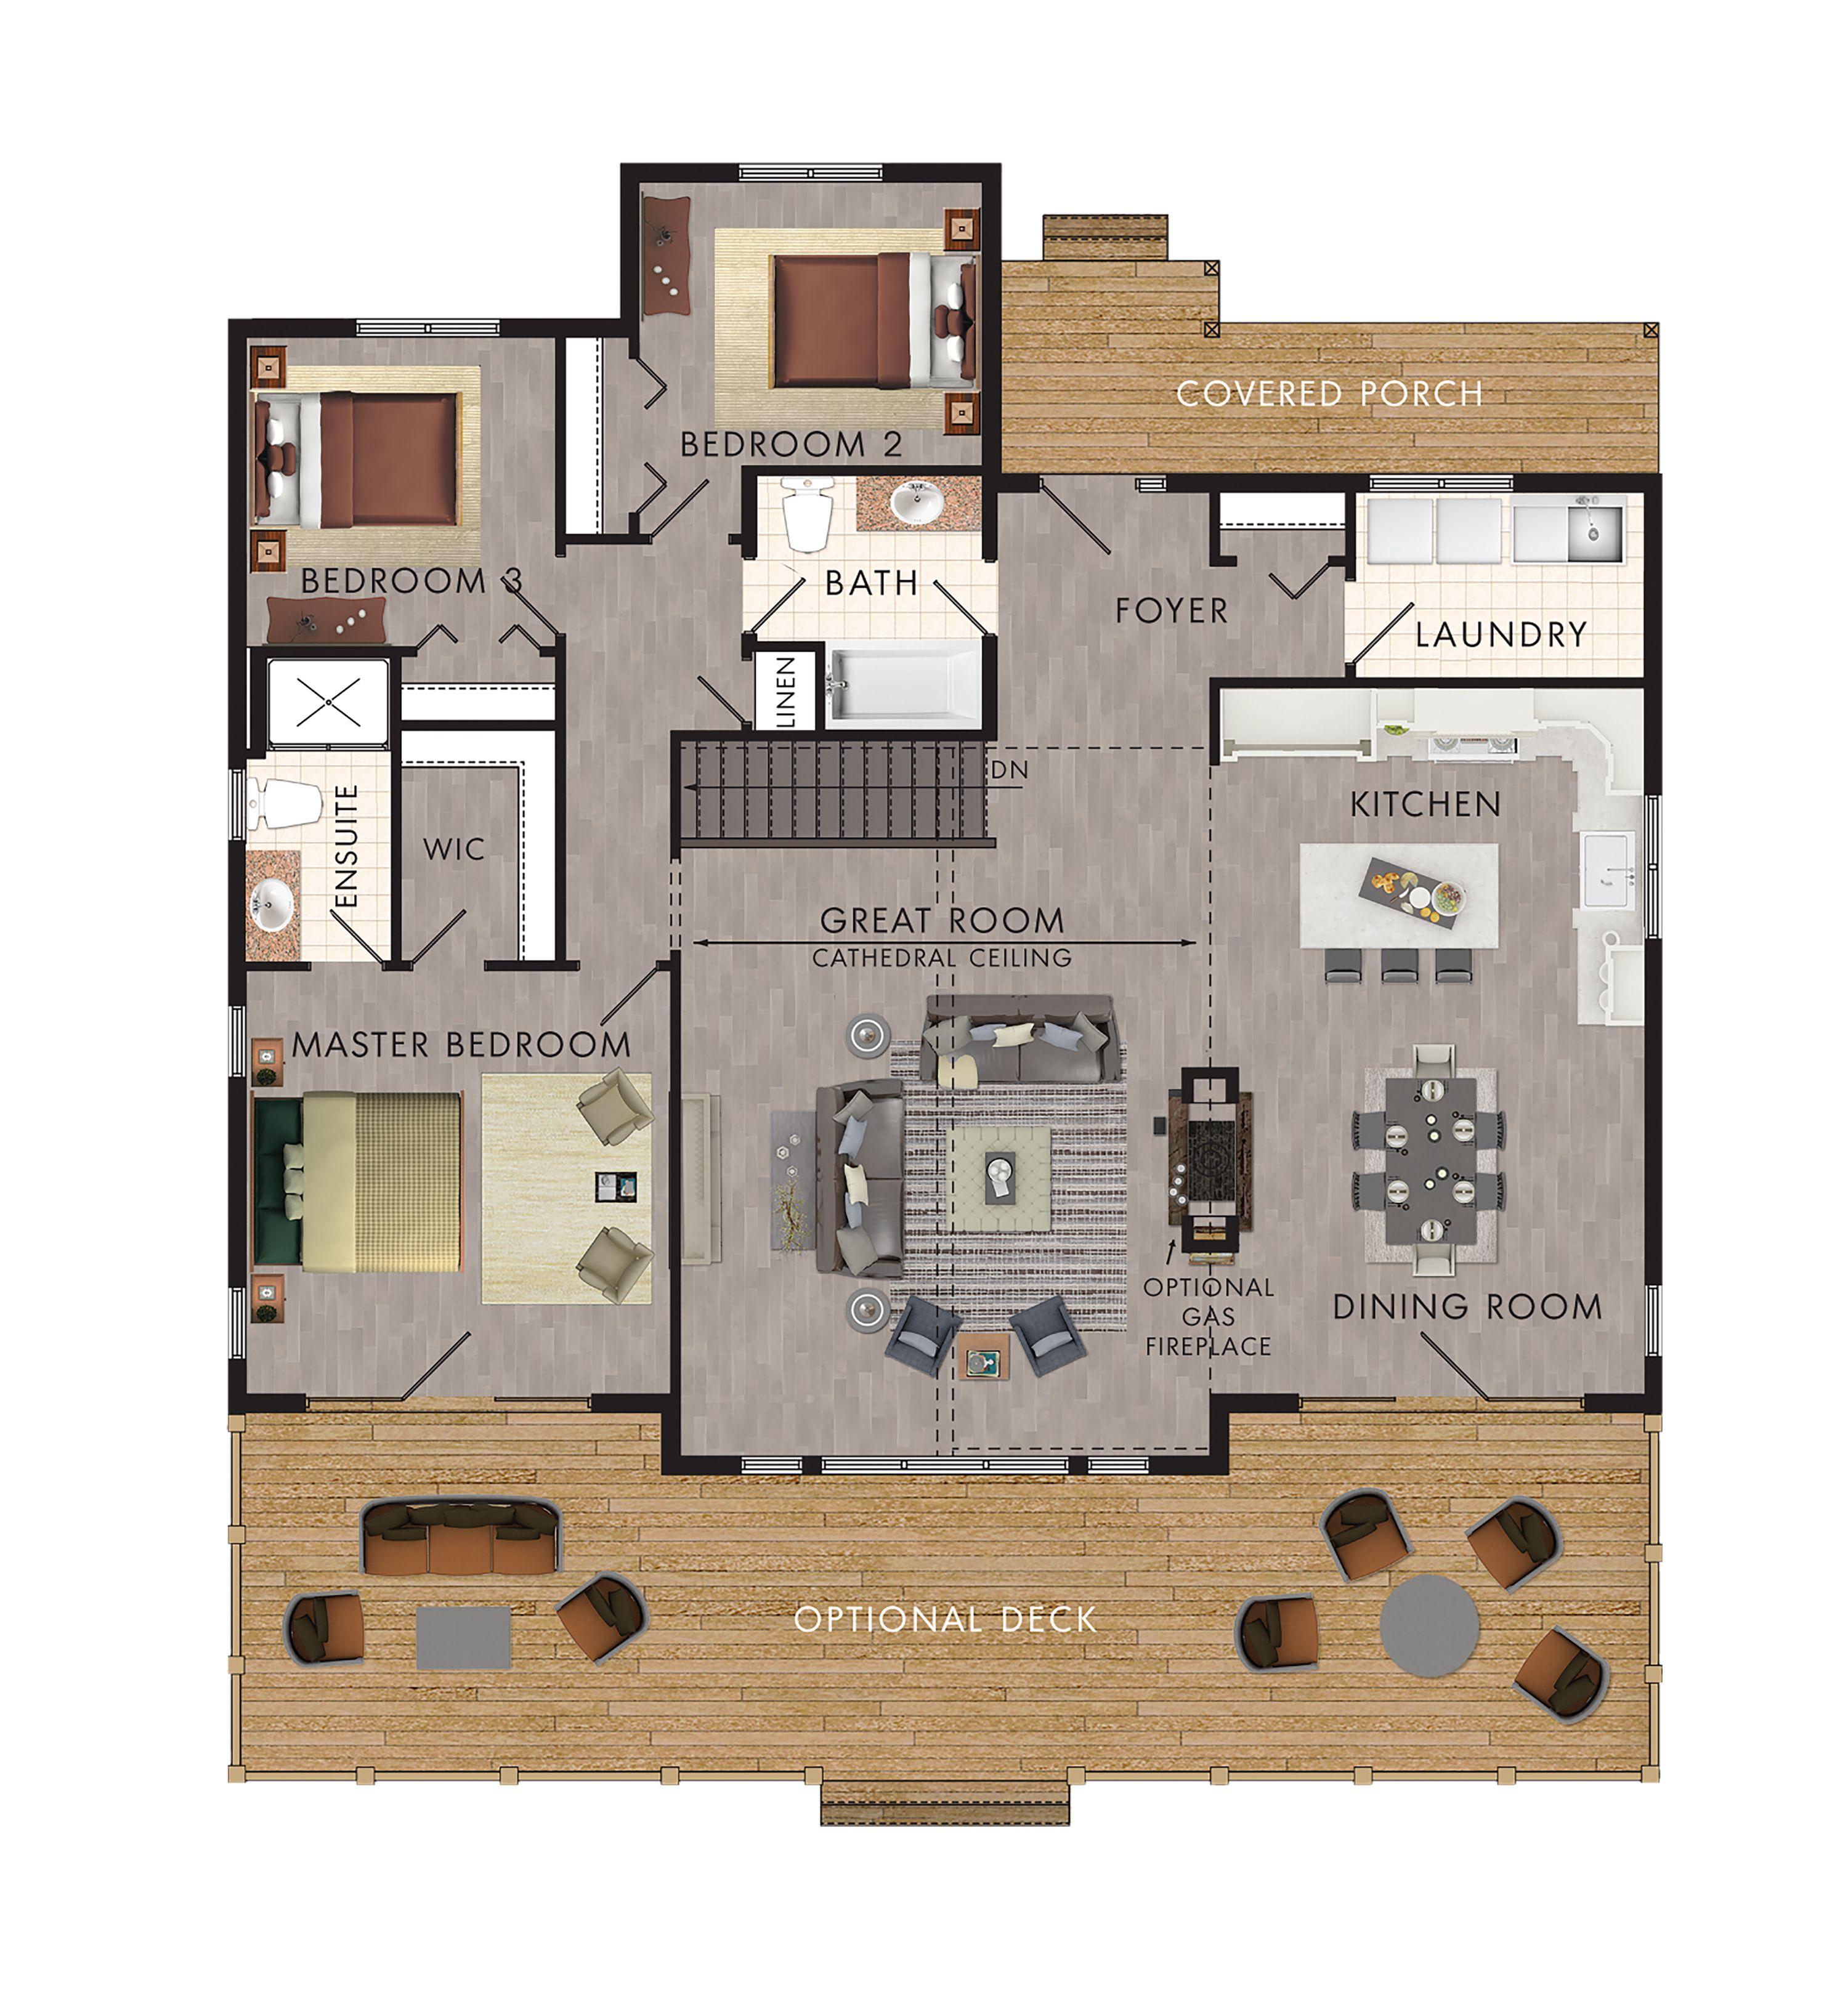 beaver homes and cottages rideau homes pinterest. Black Bedroom Furniture Sets. Home Design Ideas